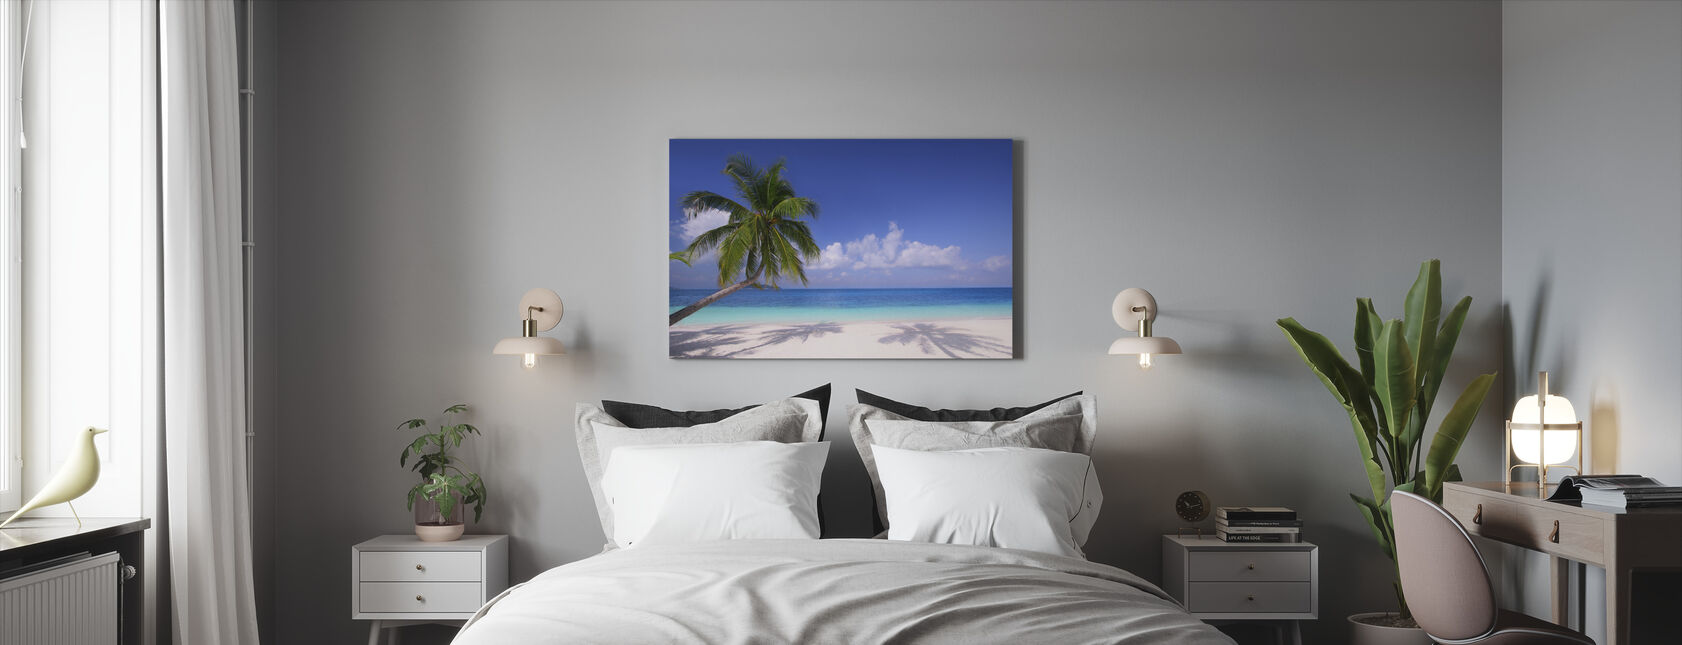 Saaren paratiisi - Canvastaulu - Makuuhuone